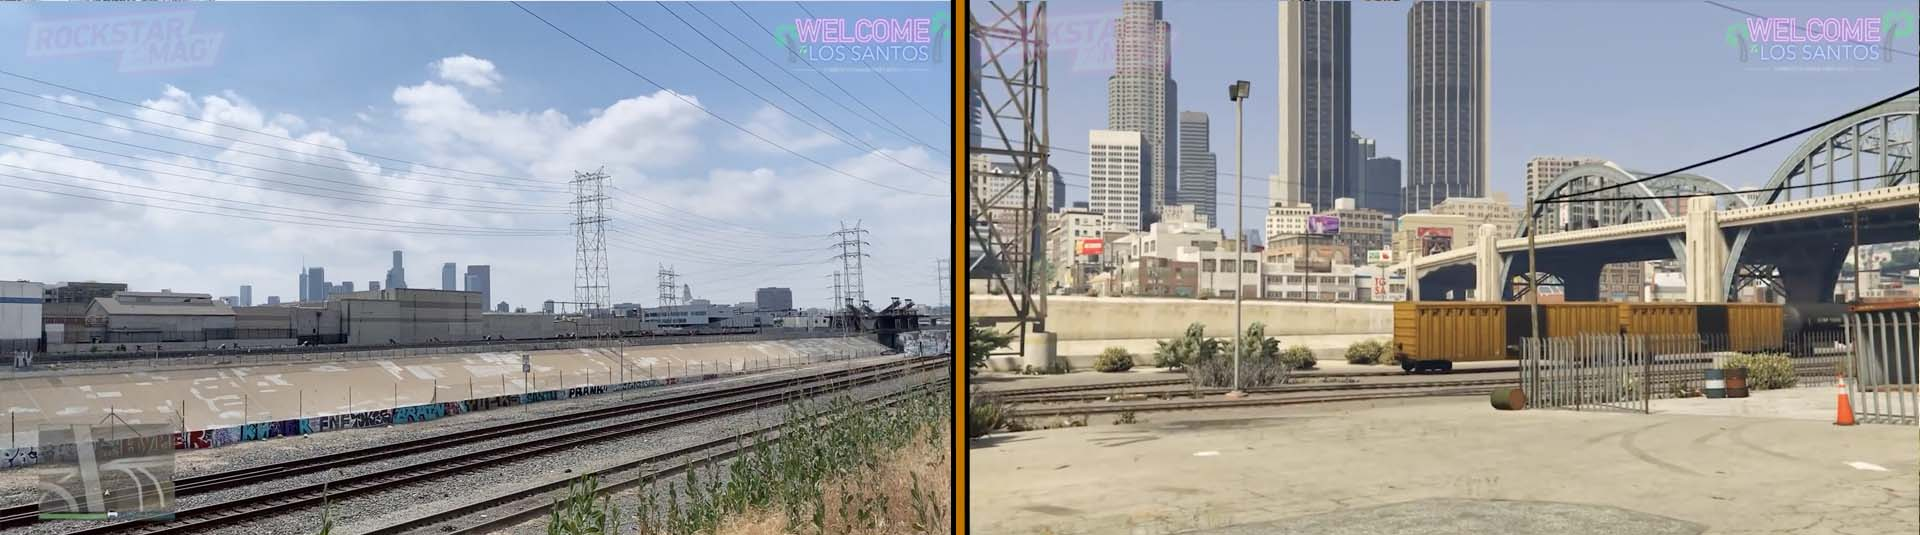 Galileo Park 12 : Rails Trains